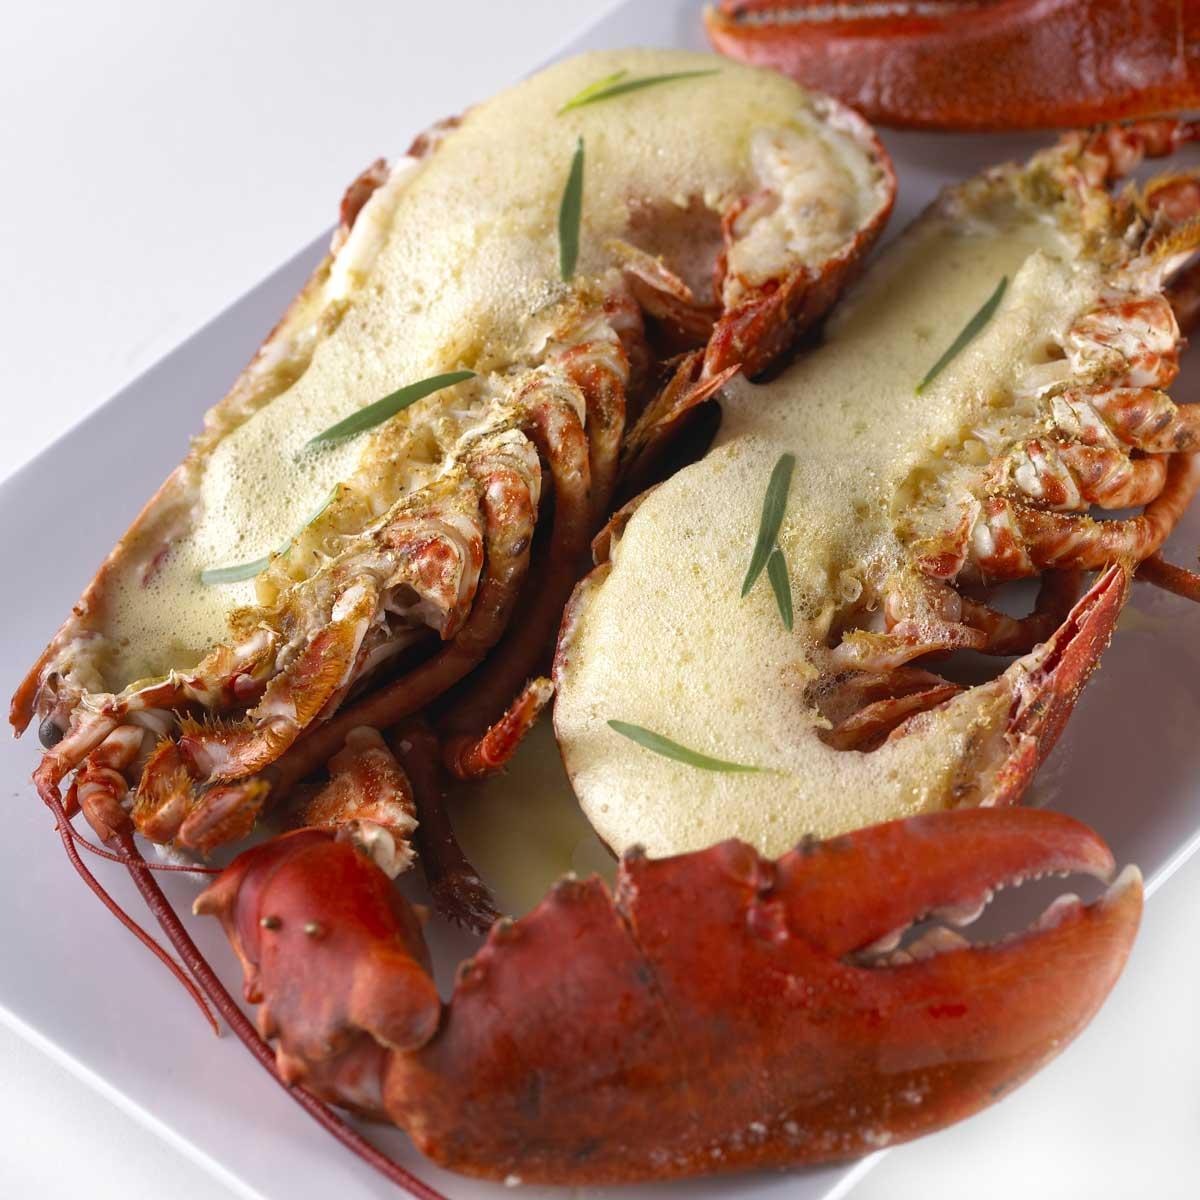 Recette homard grill sabayon au champagne cuisine - Recette homard grille ...